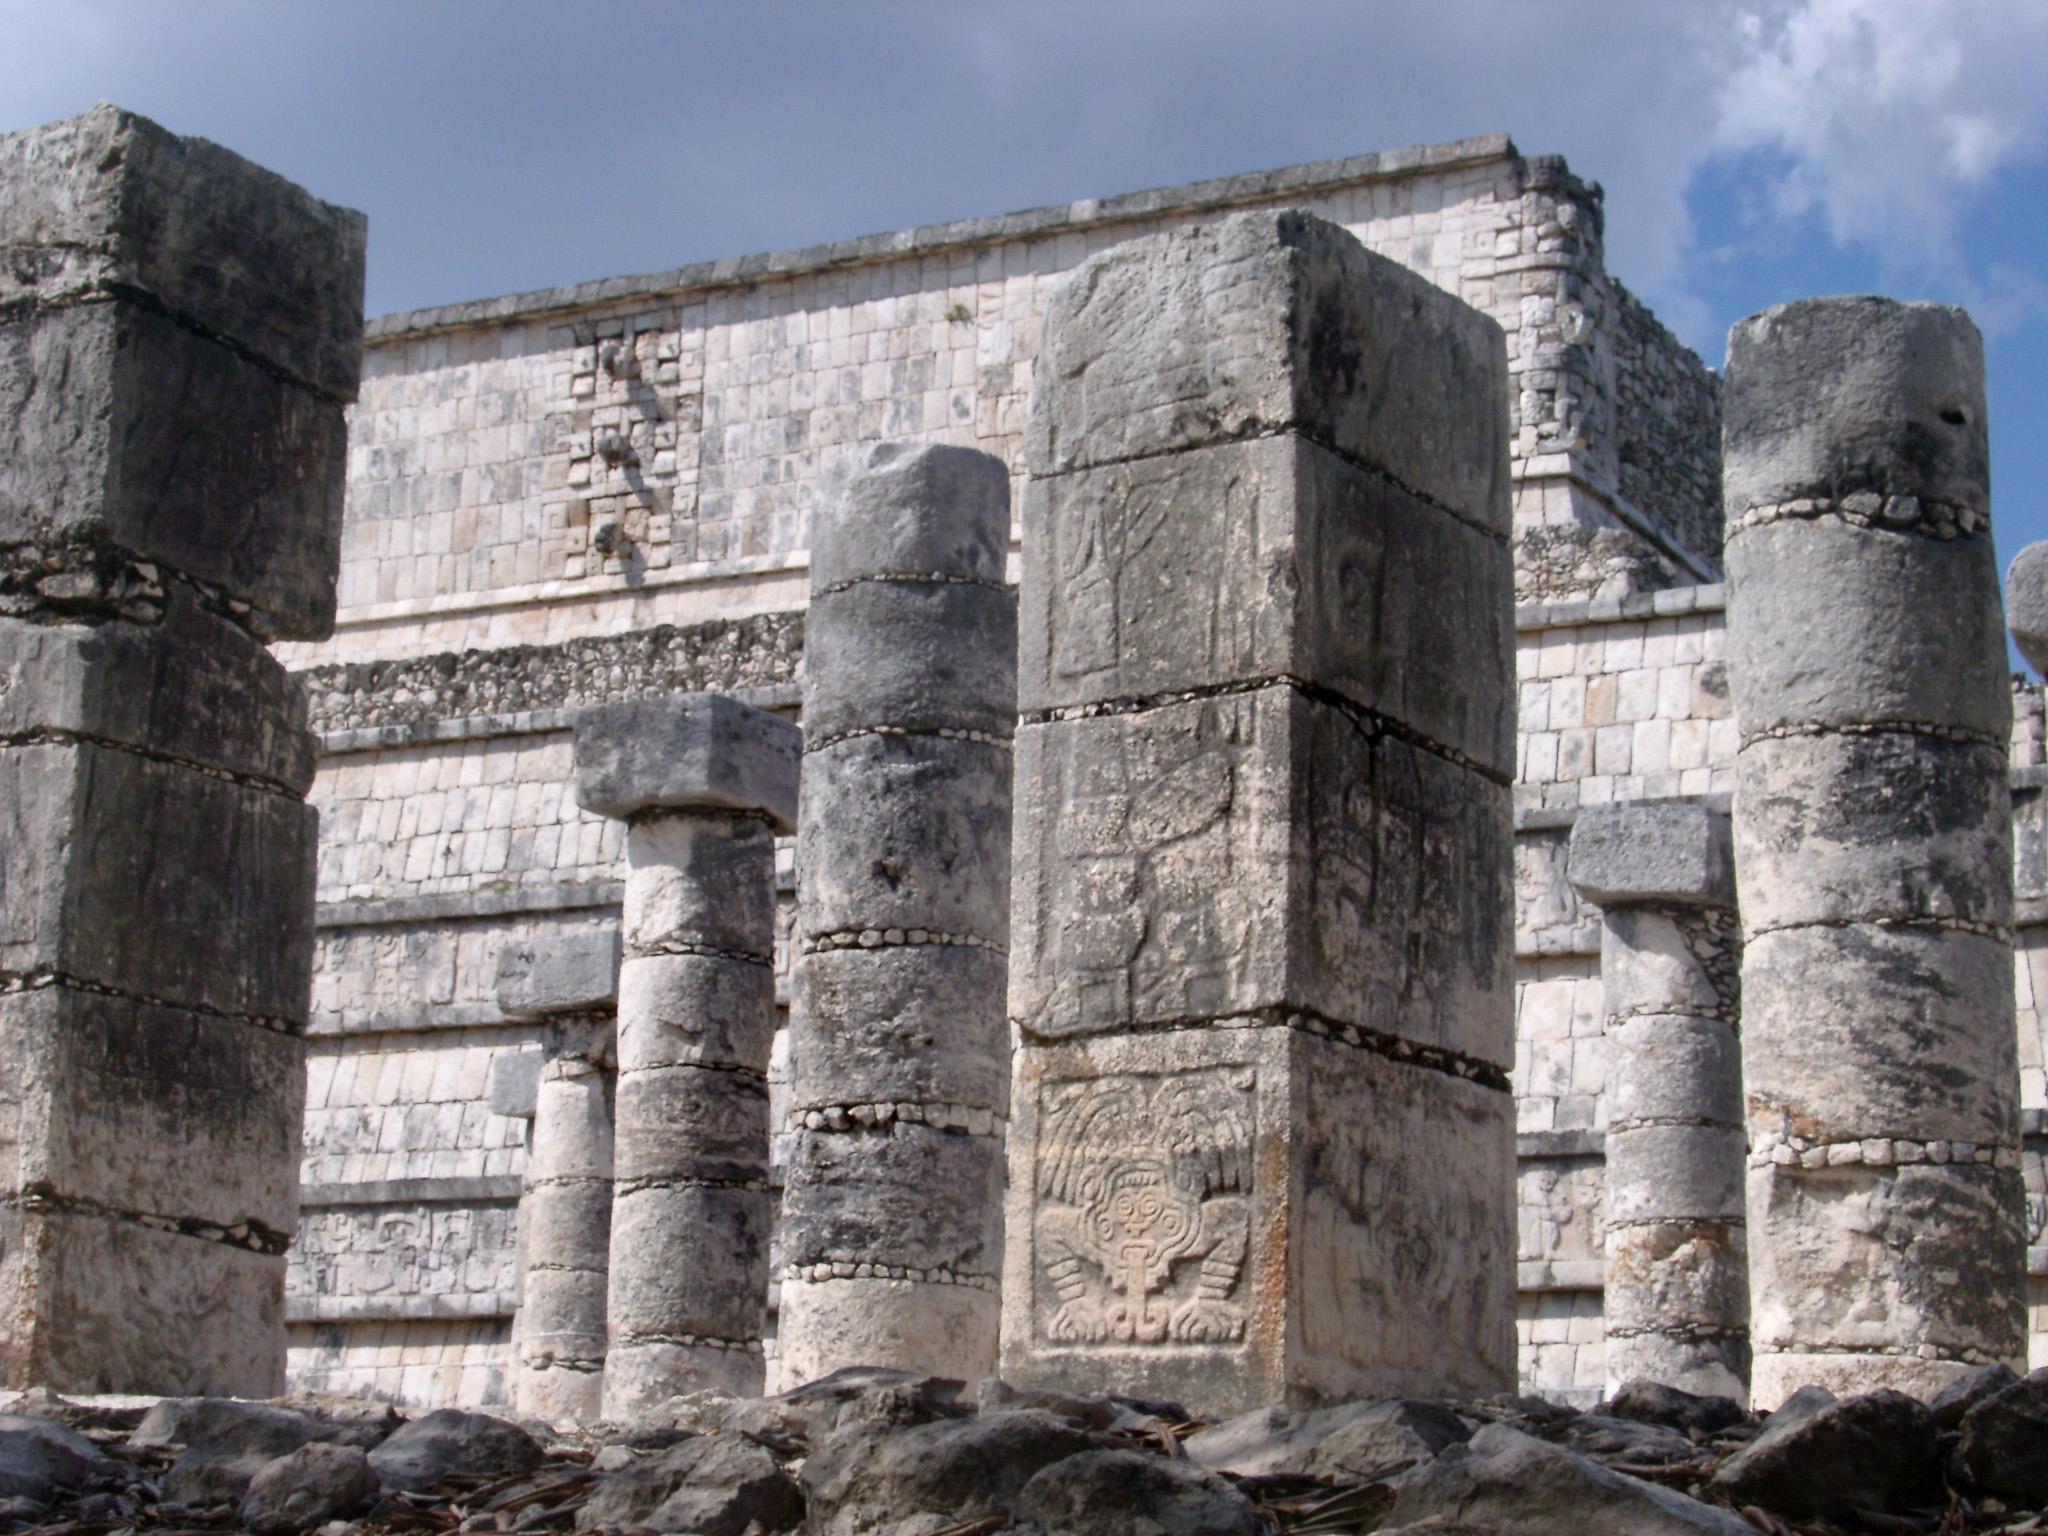 Building Stone Pillars : Free stock photo of stone columns at chitzen itza